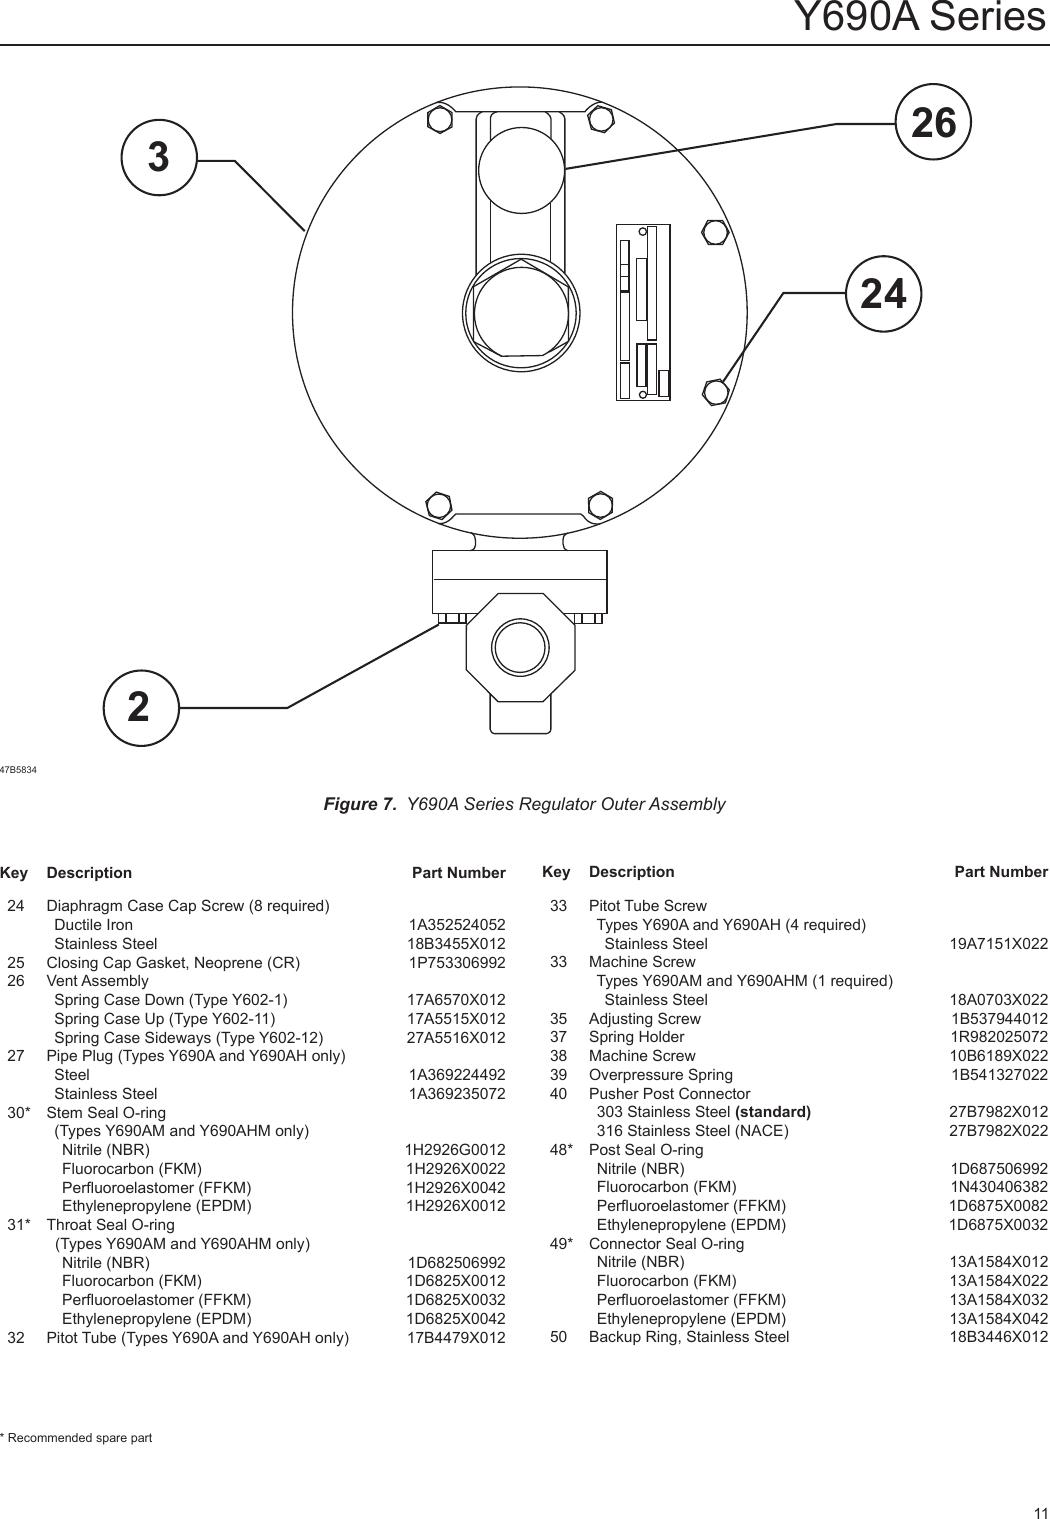 Emerson Y690A Series Gas Blanketing Regulators Instruction